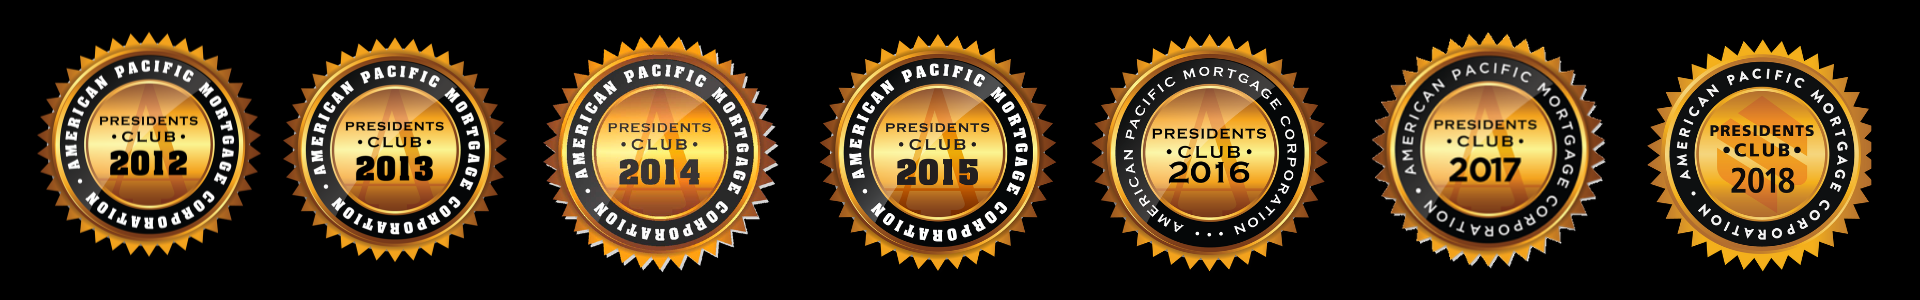 Presidents Club Banner